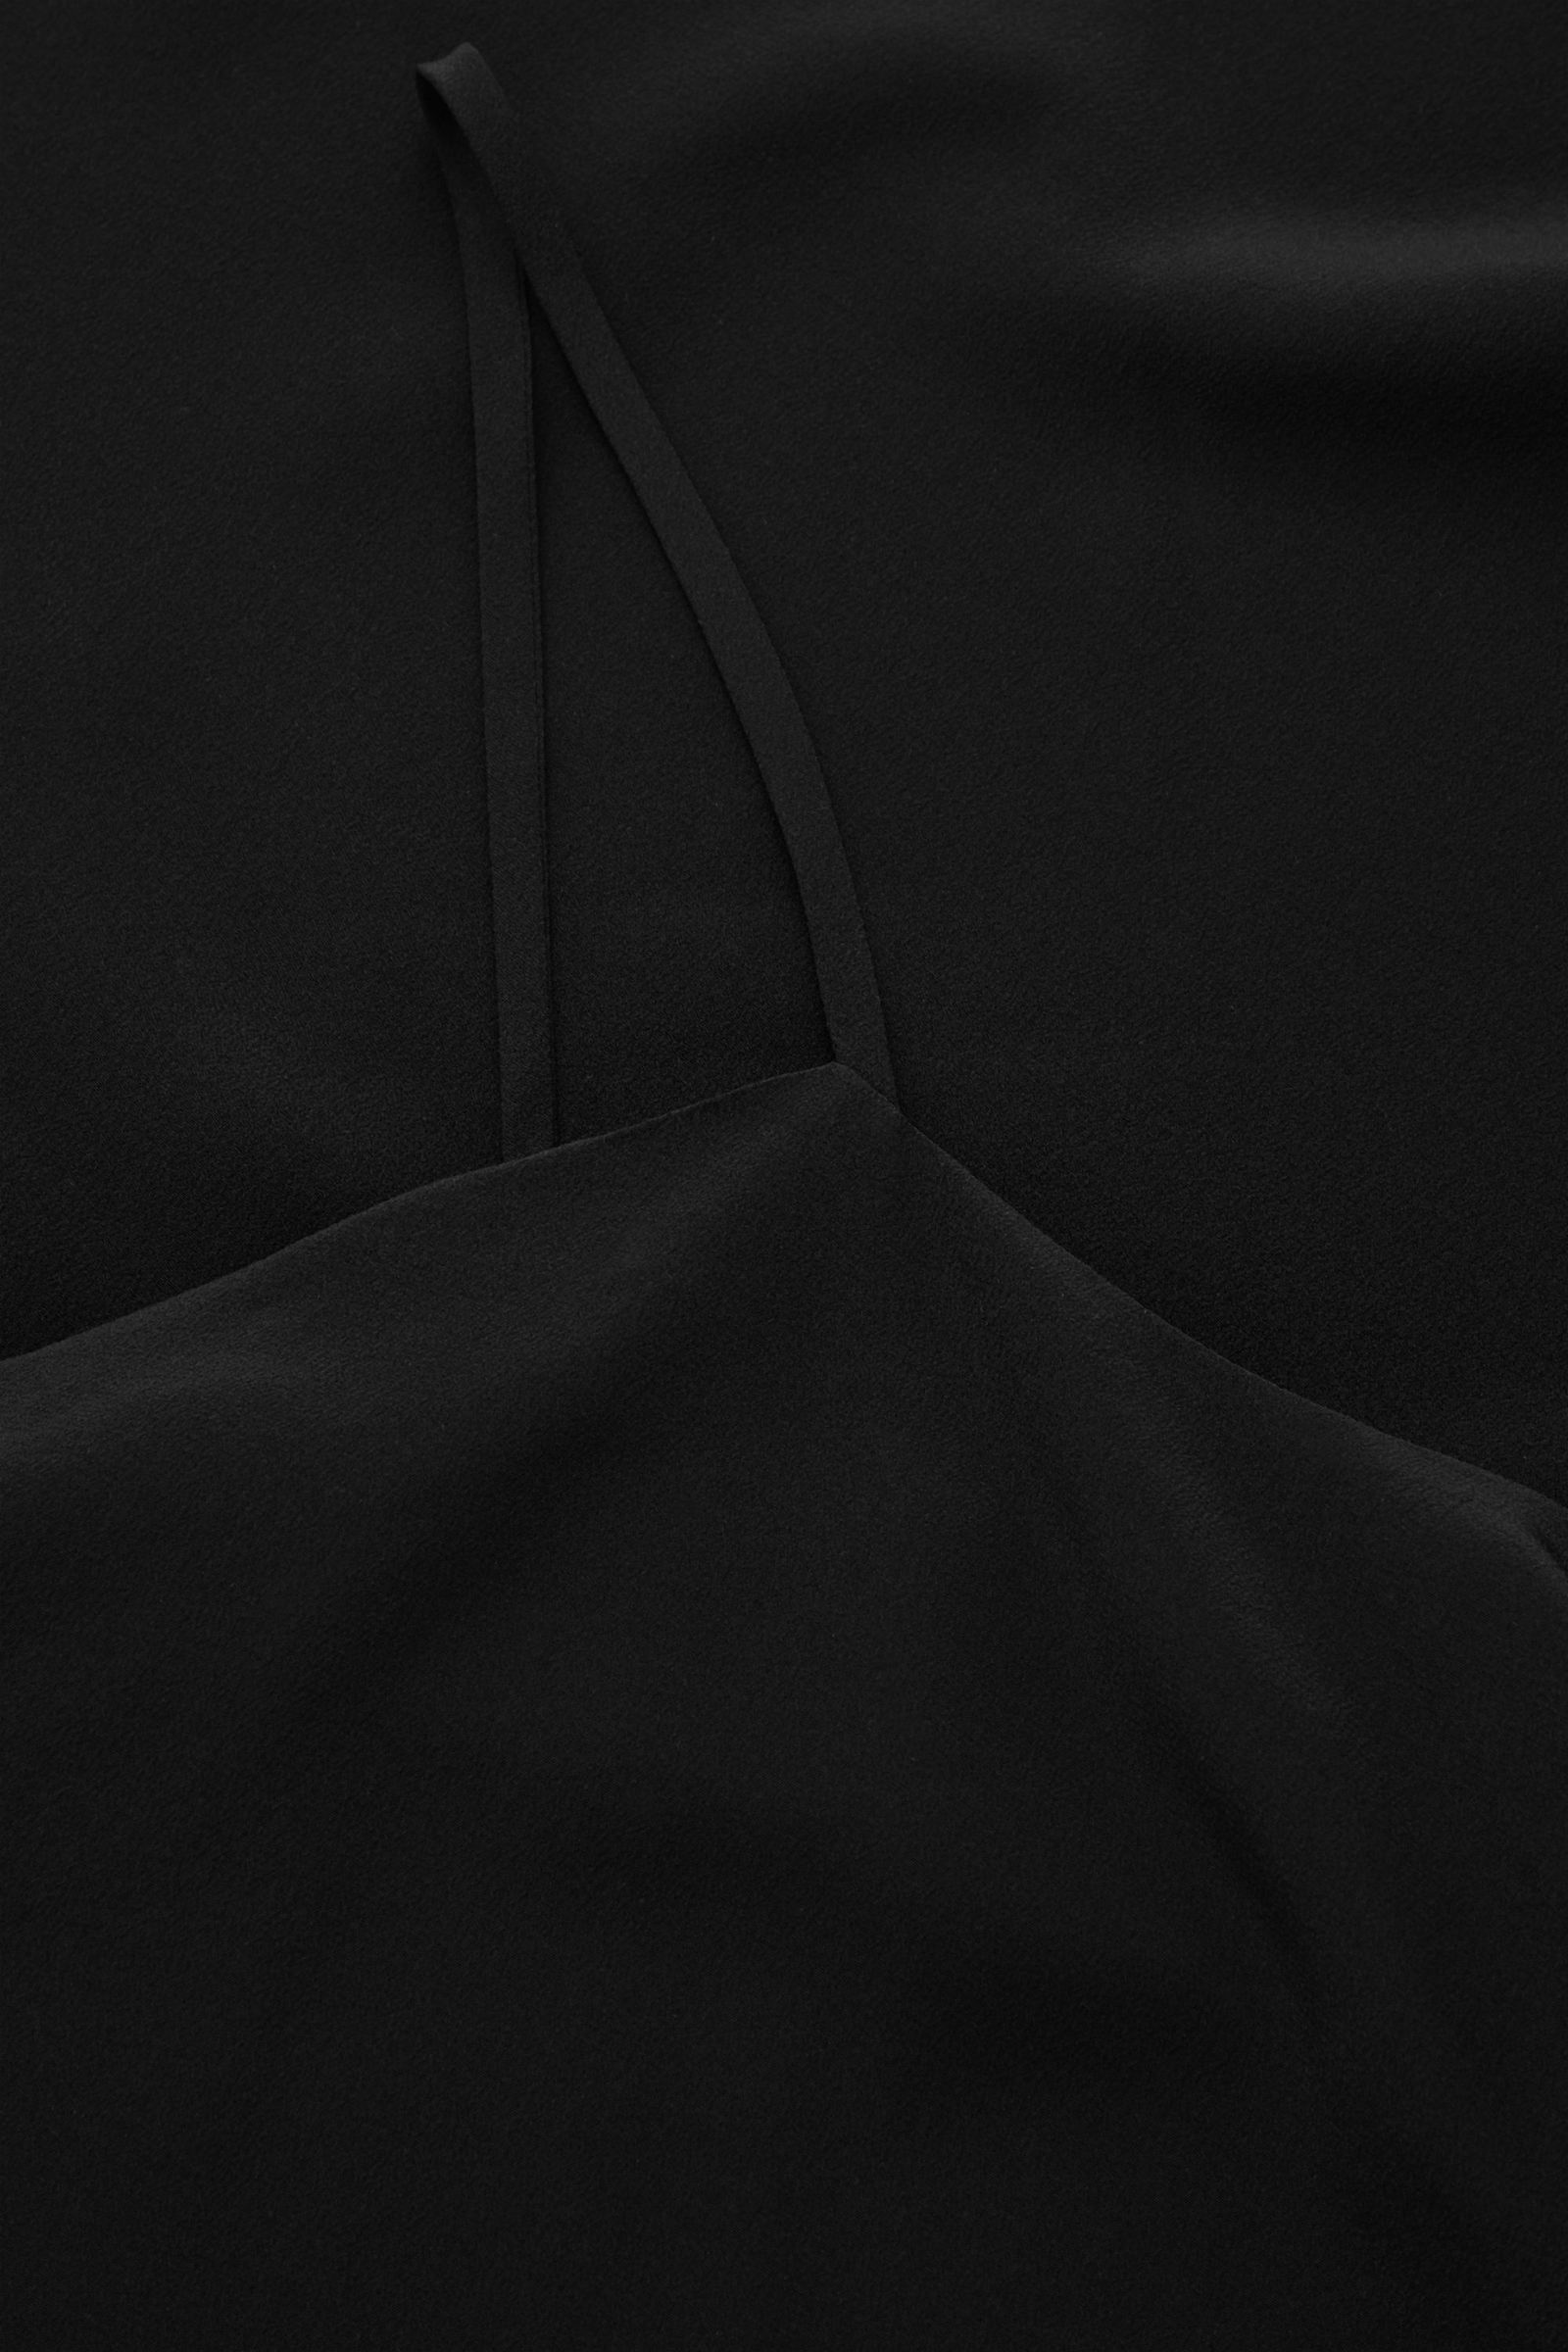 COS 오픈 백 실크 슬립 드레스의 블랙컬러 Detail입니다.